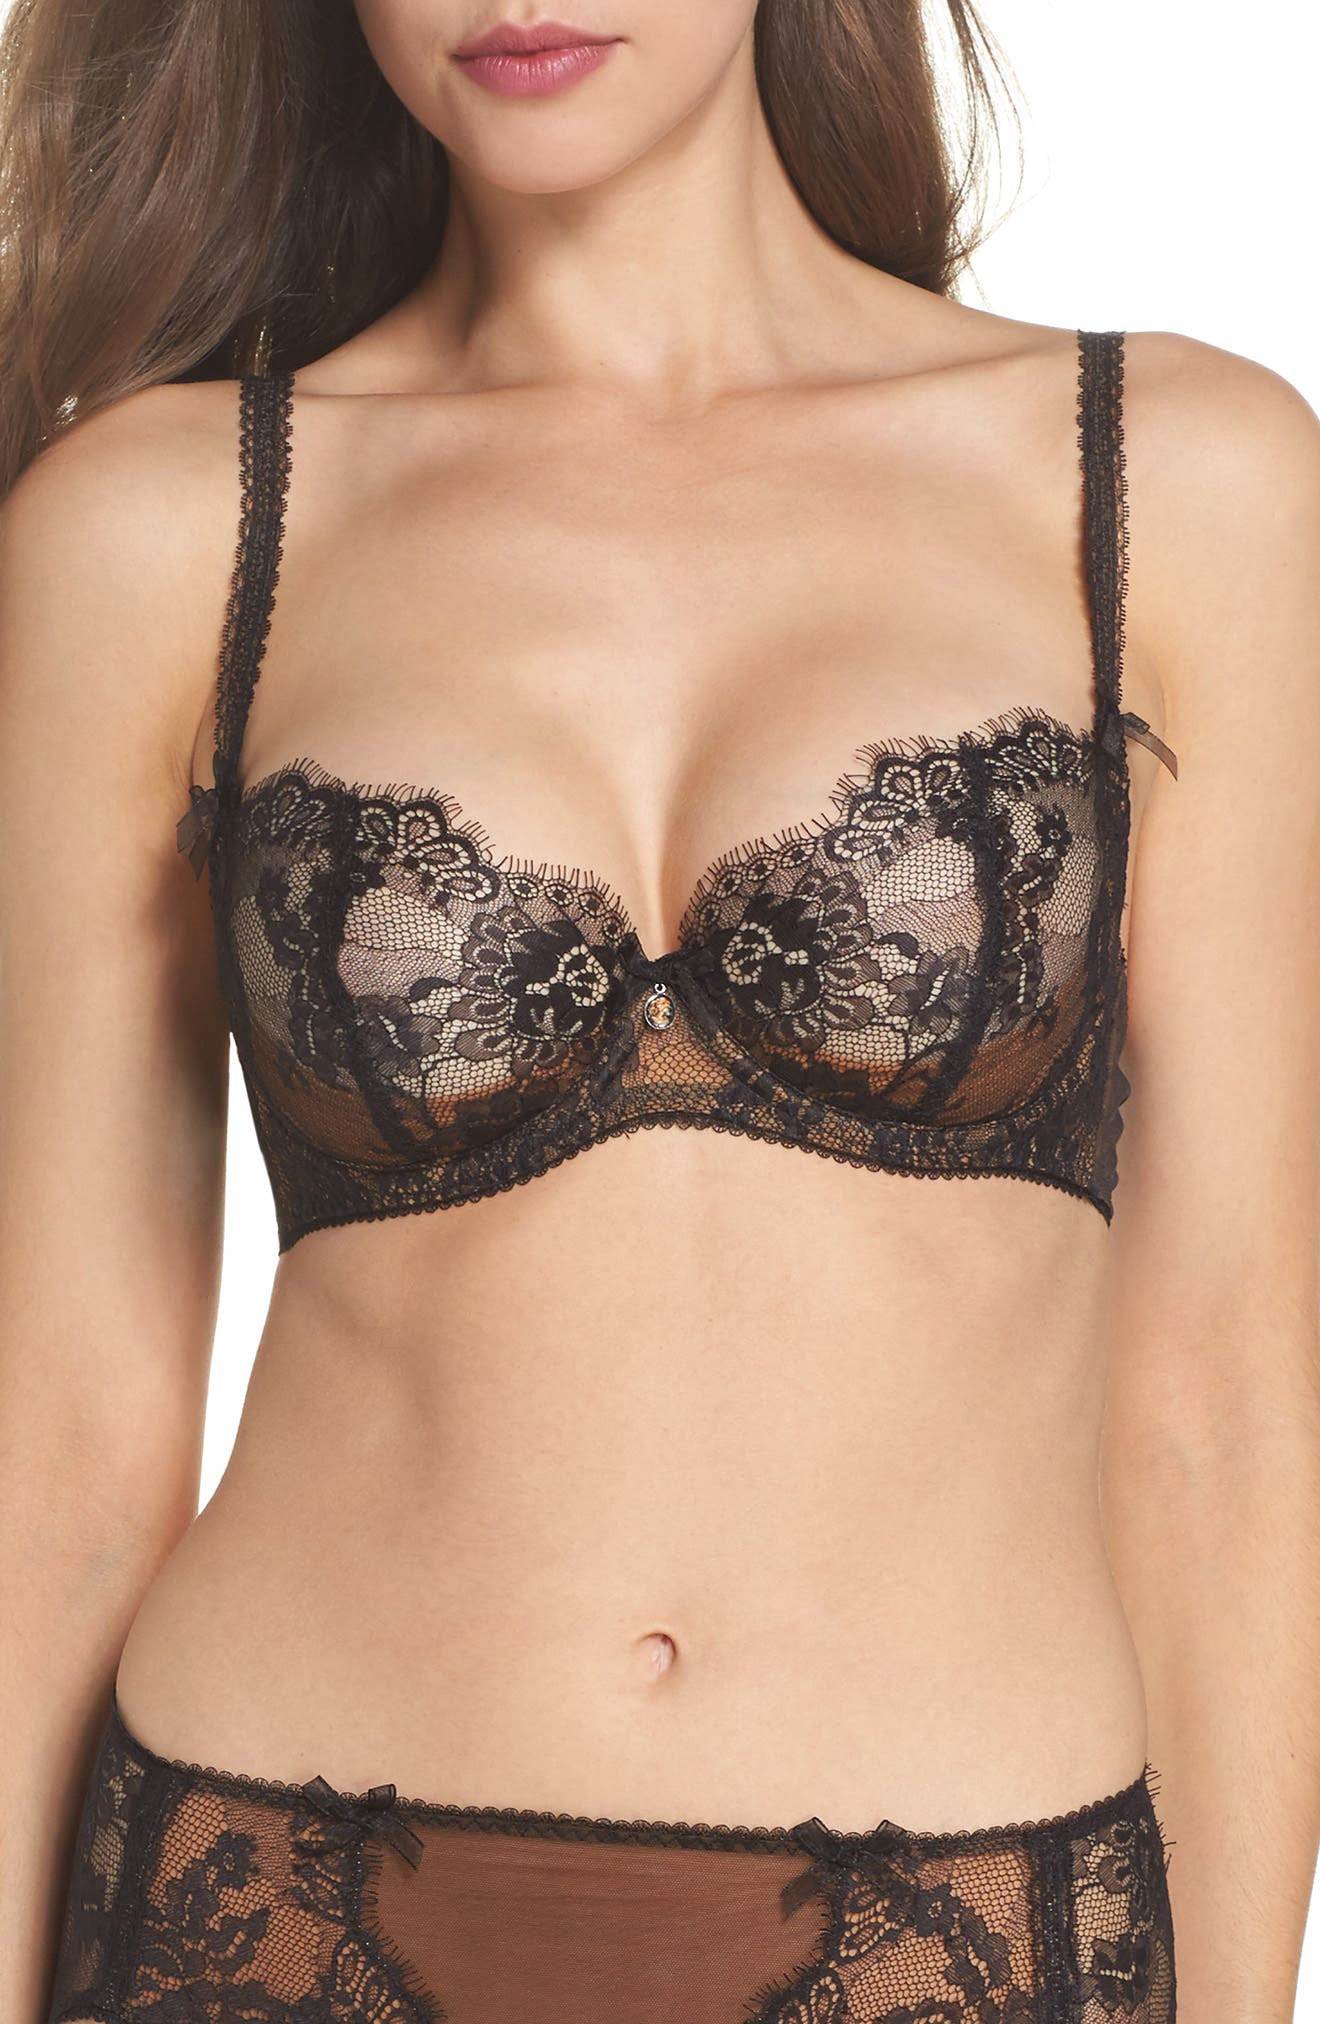 1950s Lingerie History – Bras, Girdles, Slips, Panties, Garters Womens Dita Von Teese Savior Faire Sheers Underwire Lace Bra Size 36C - Black $75.00 AT vintagedancer.com